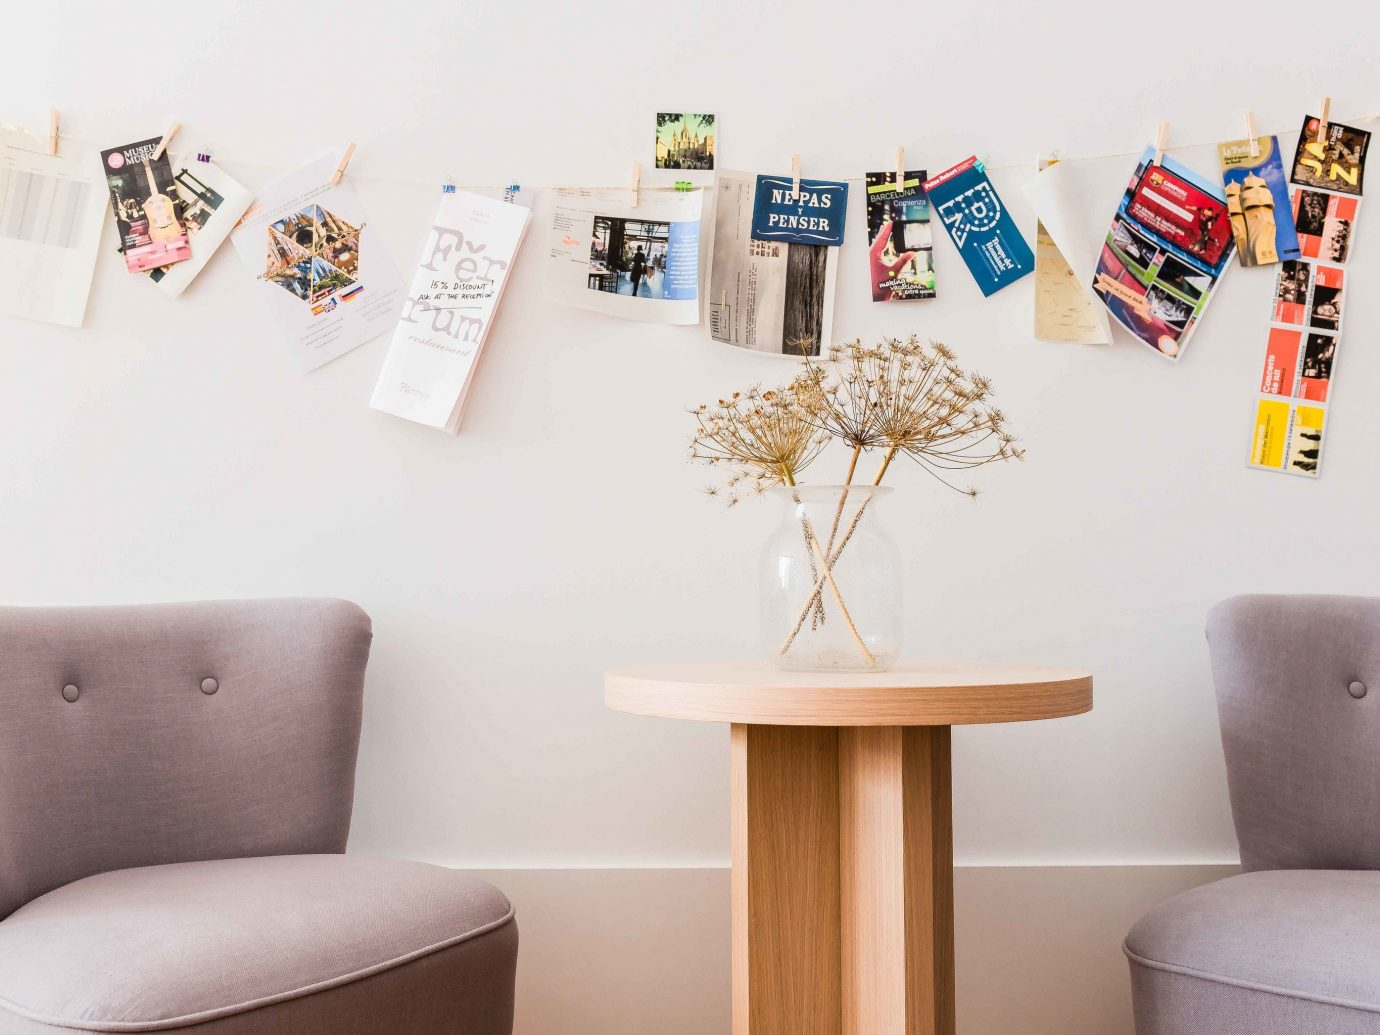 Hotels wall indoor art interior design Design furniture seat sofa colored